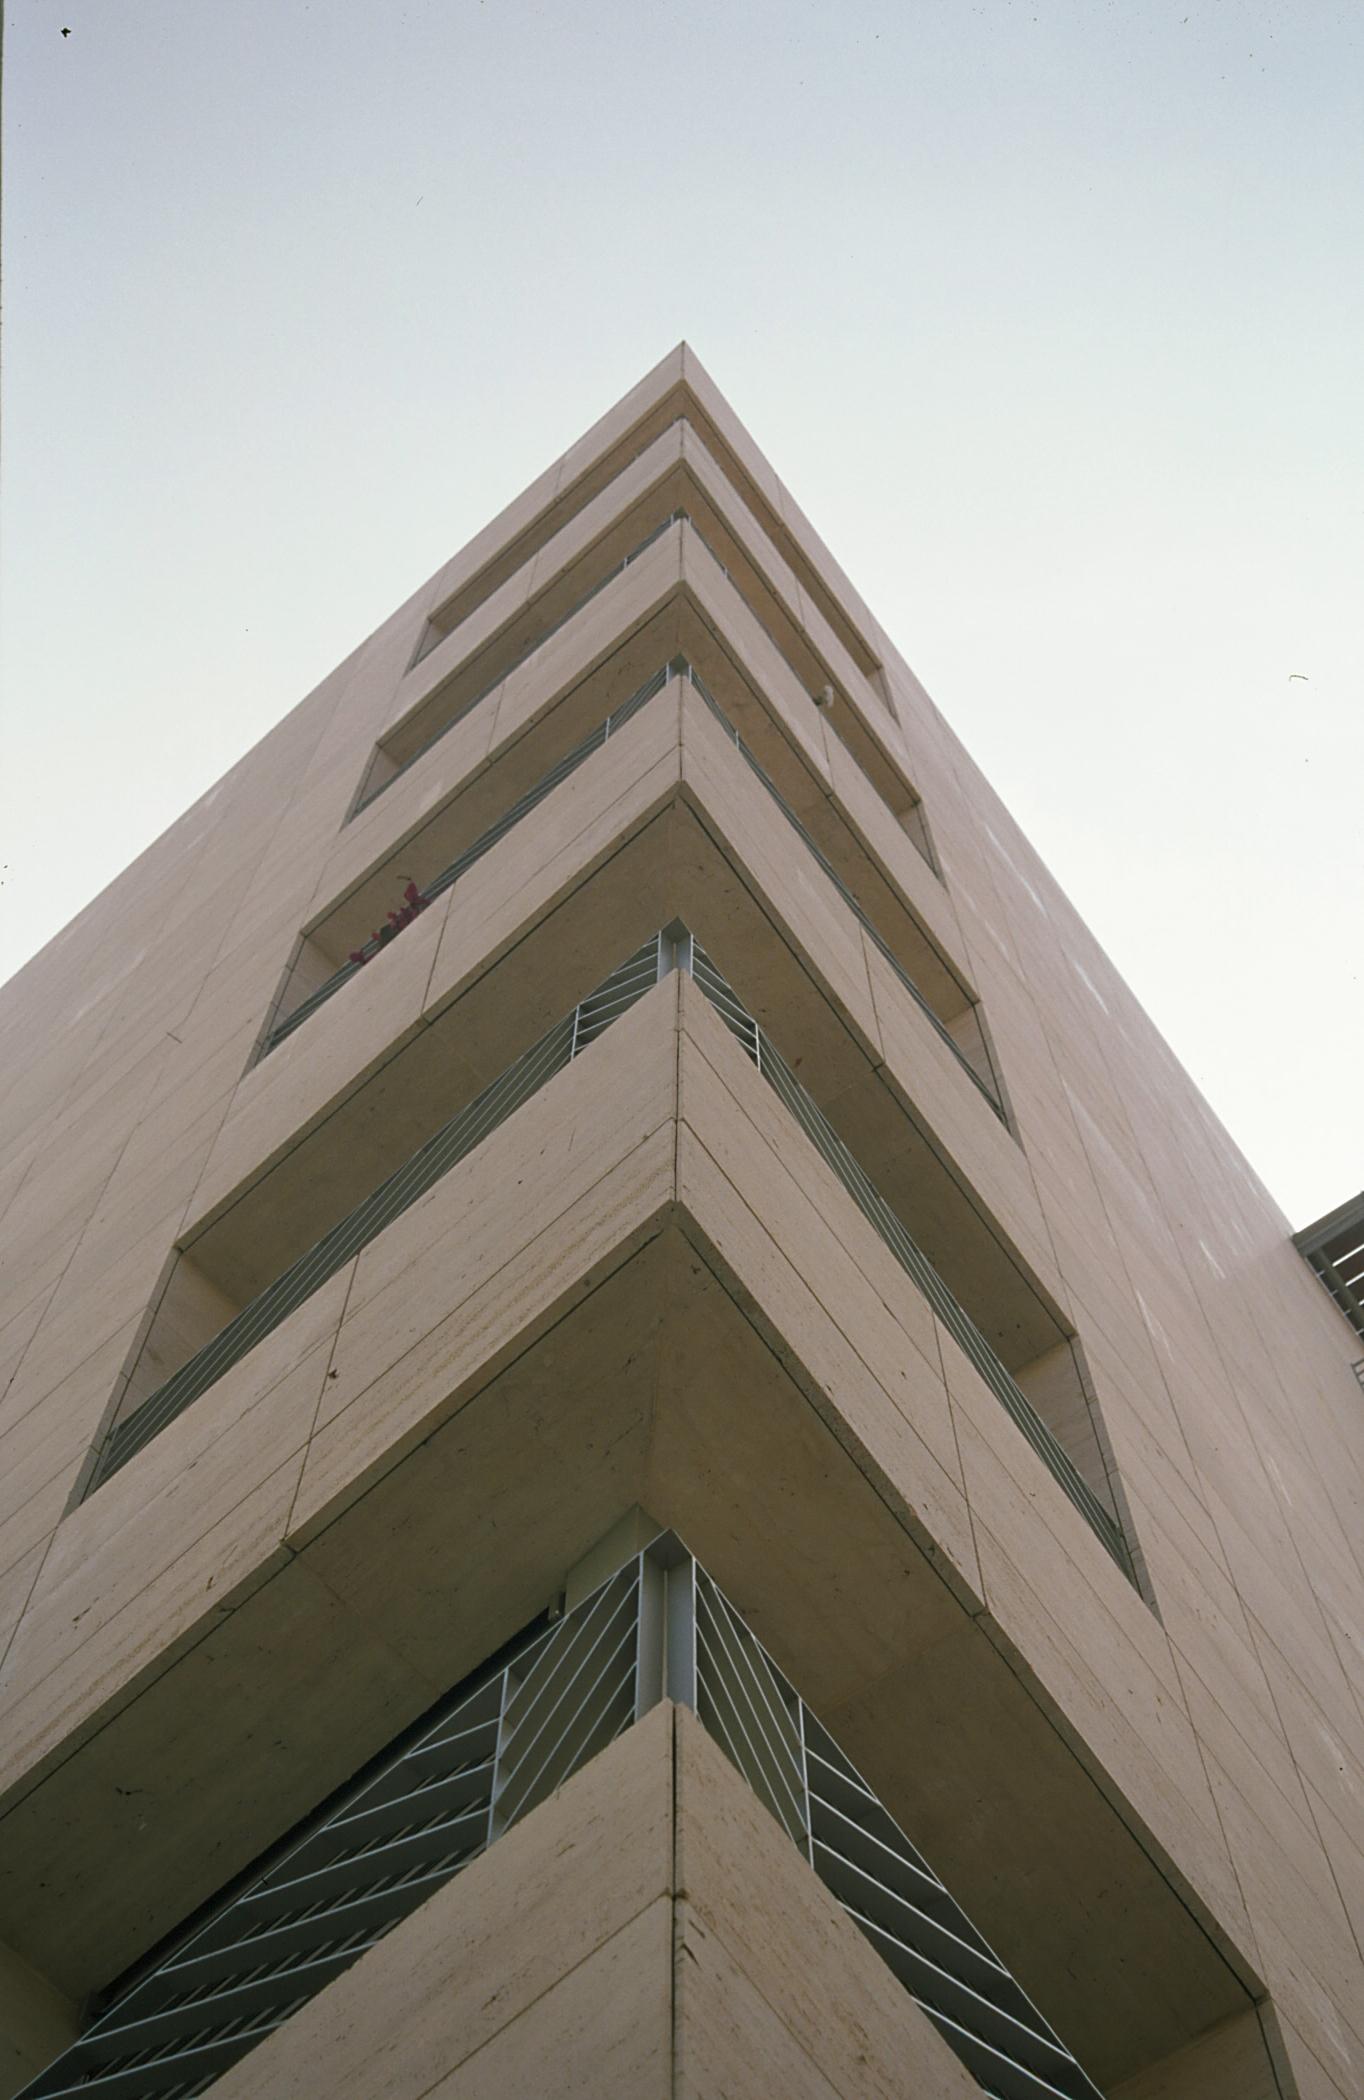 Fachadas ventiladas. Sistema Masa. Edificio viviendas tres creus